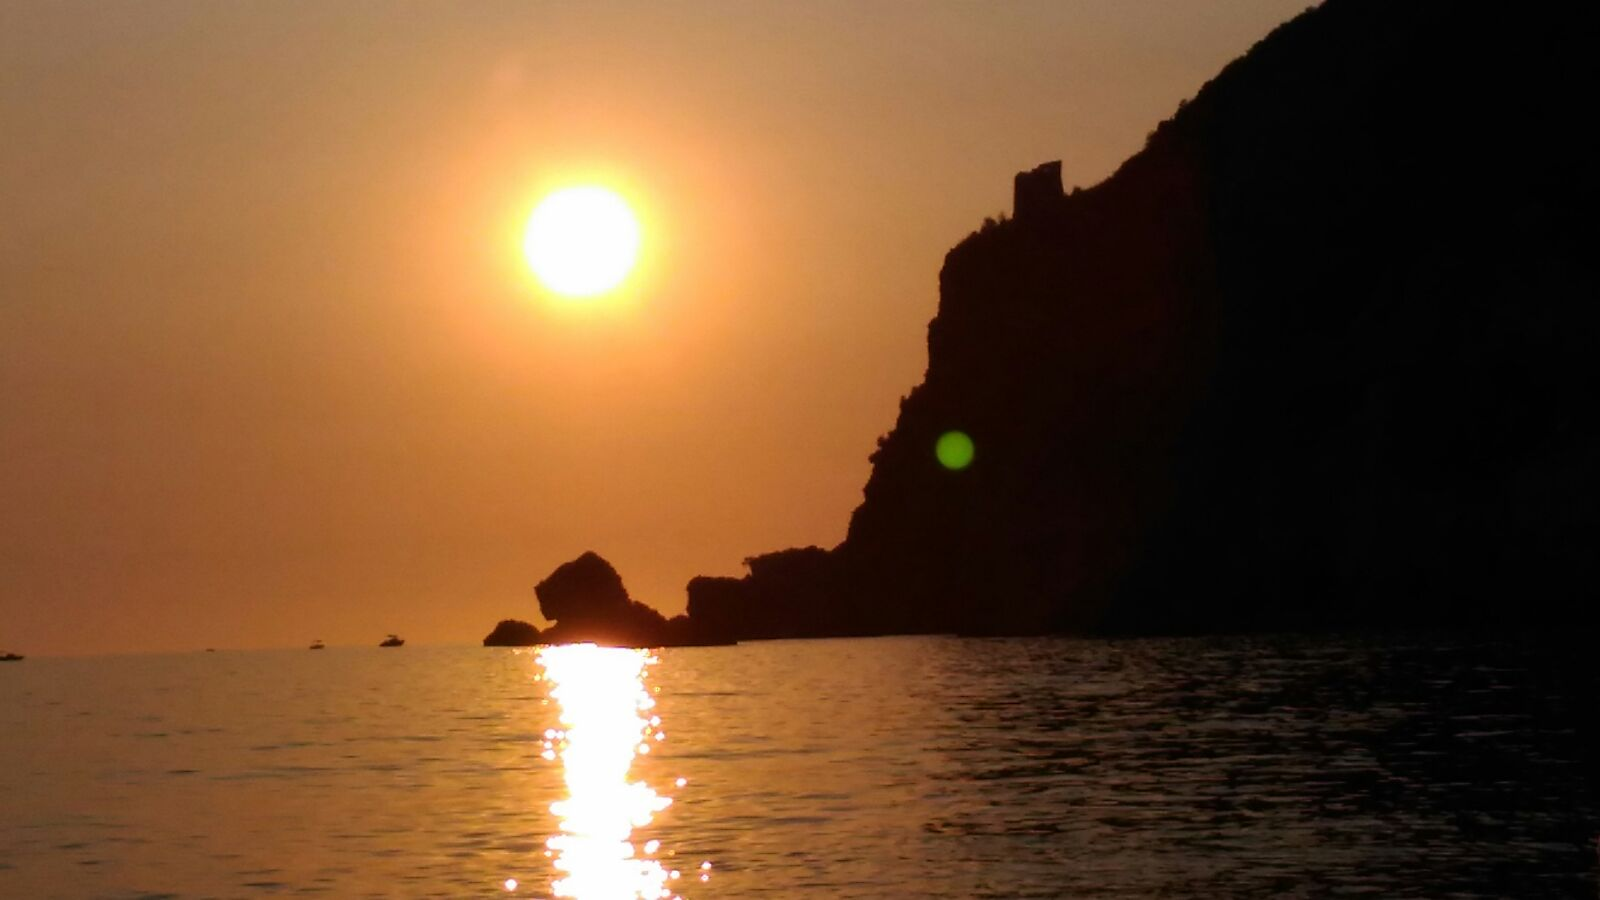 Lampetia tramontojpg